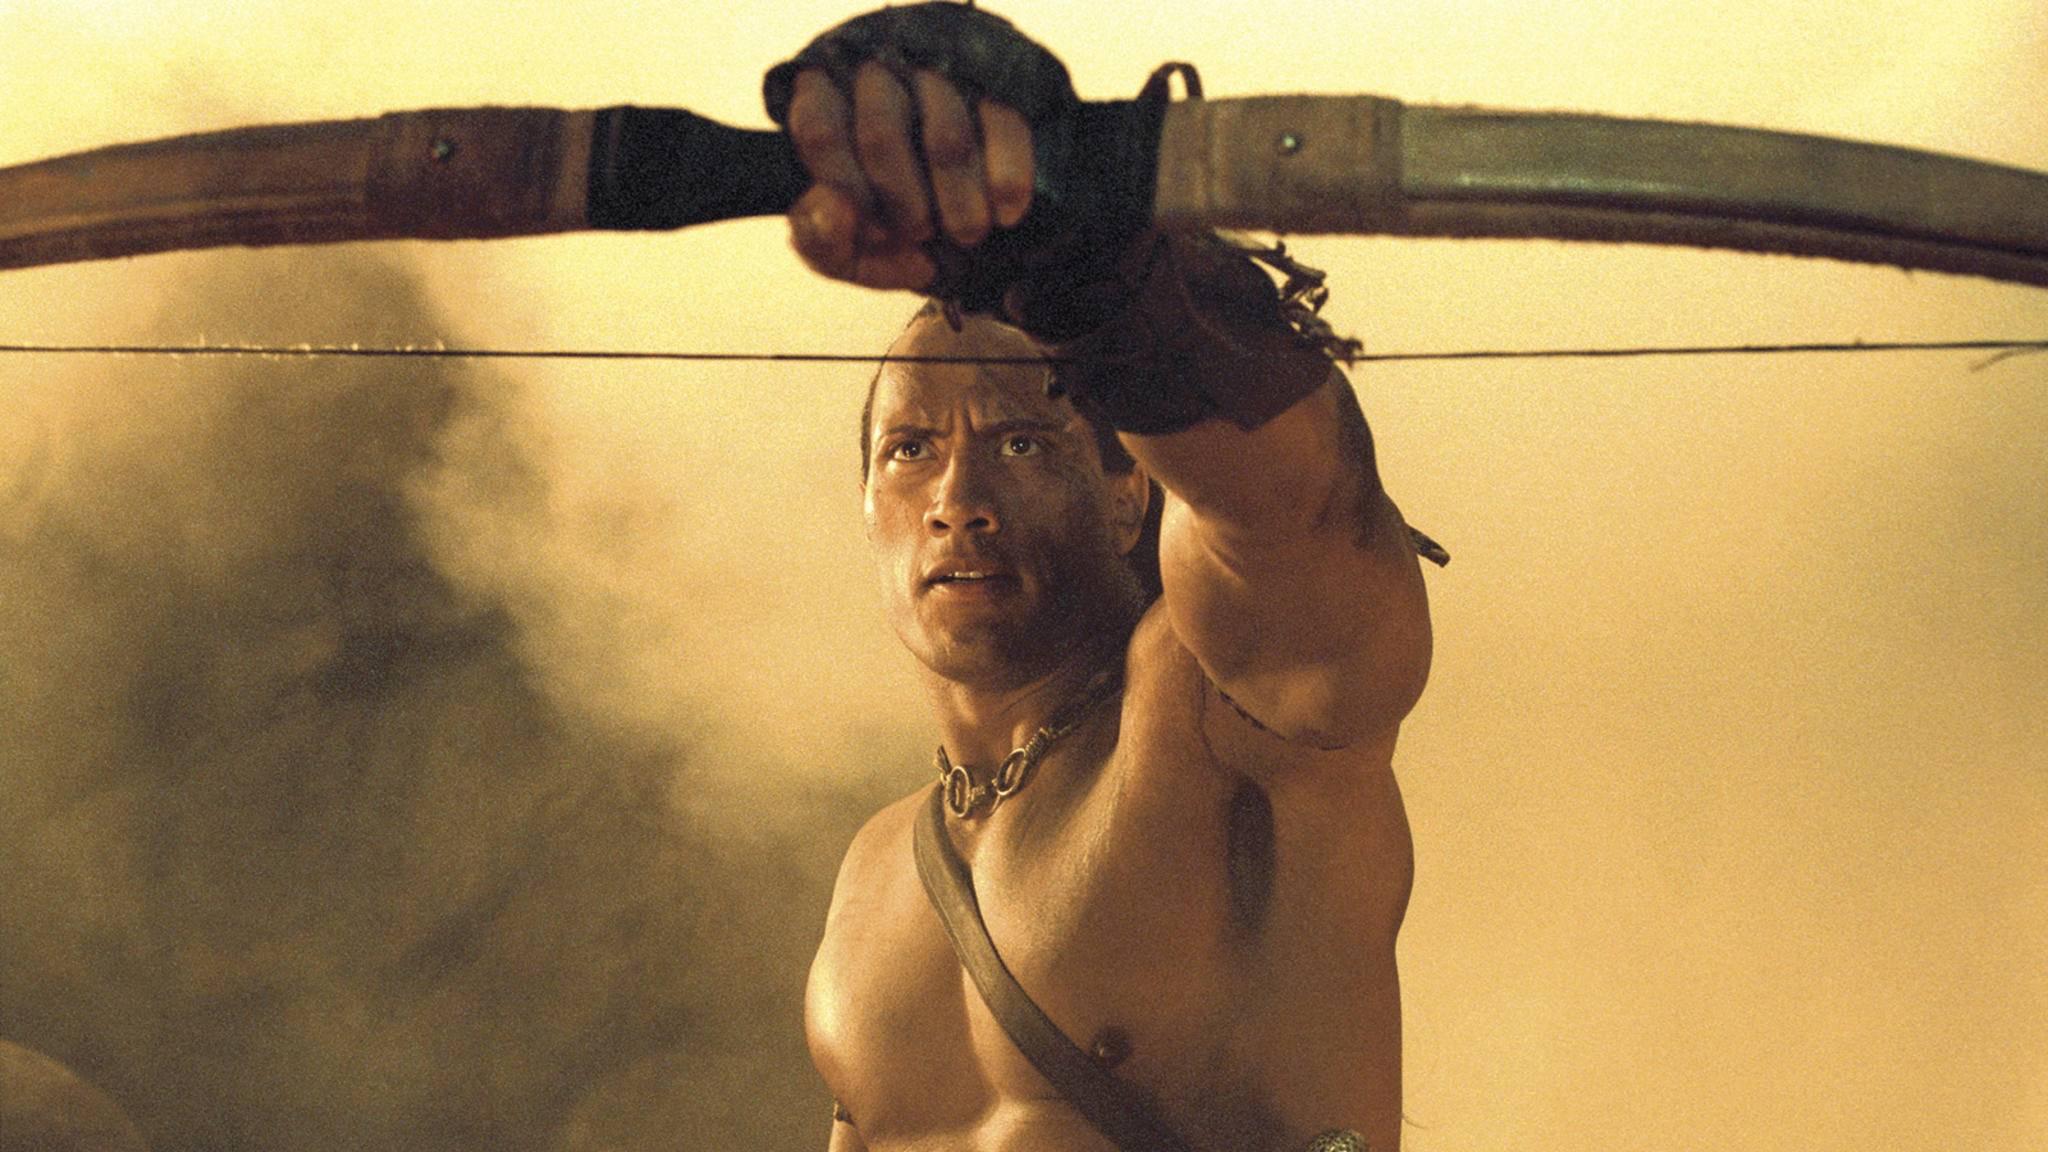 The Scorpion King Dwayne Johnson